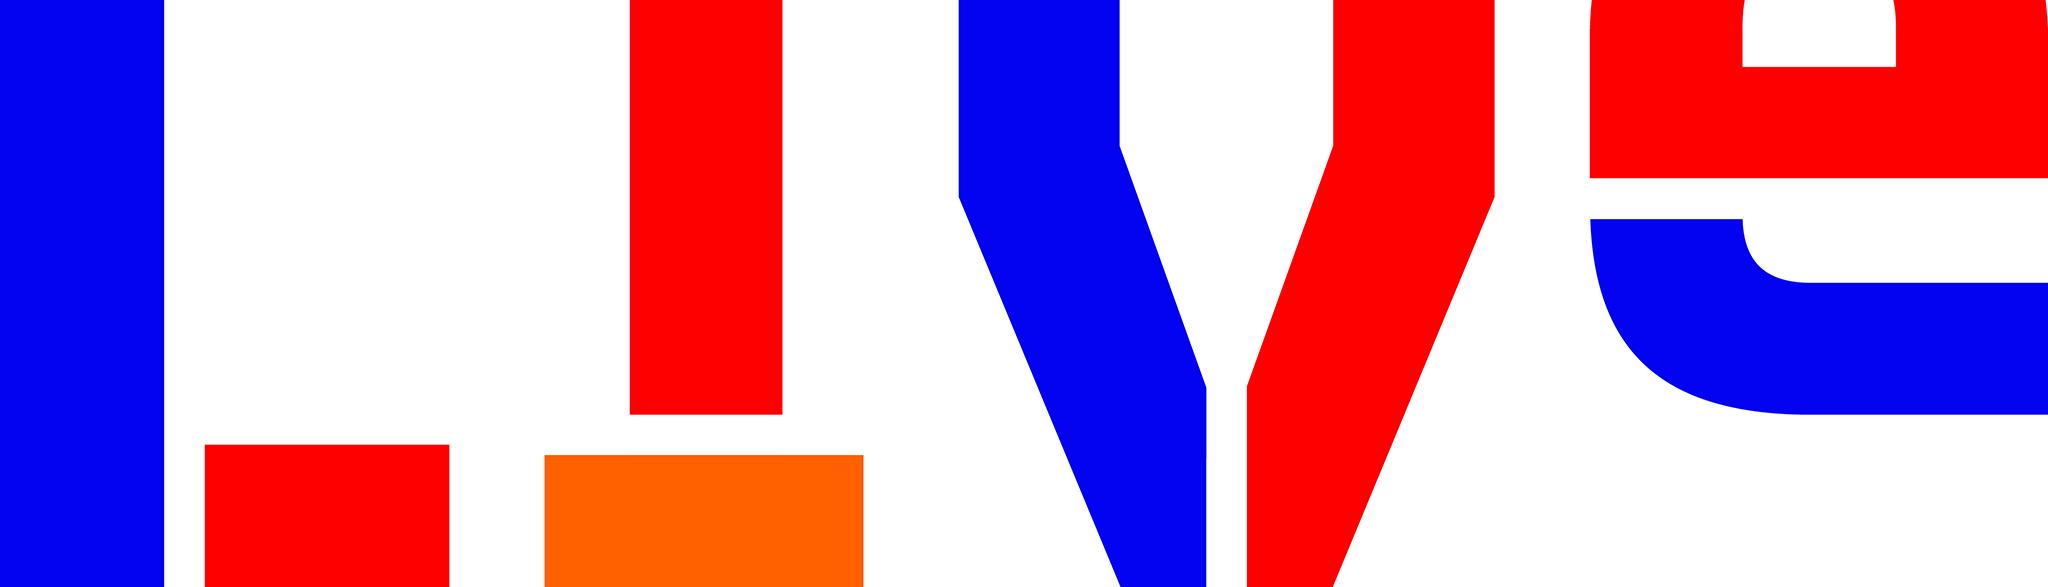 SC_PRIMARY_LIVEBLOGBANNER-04